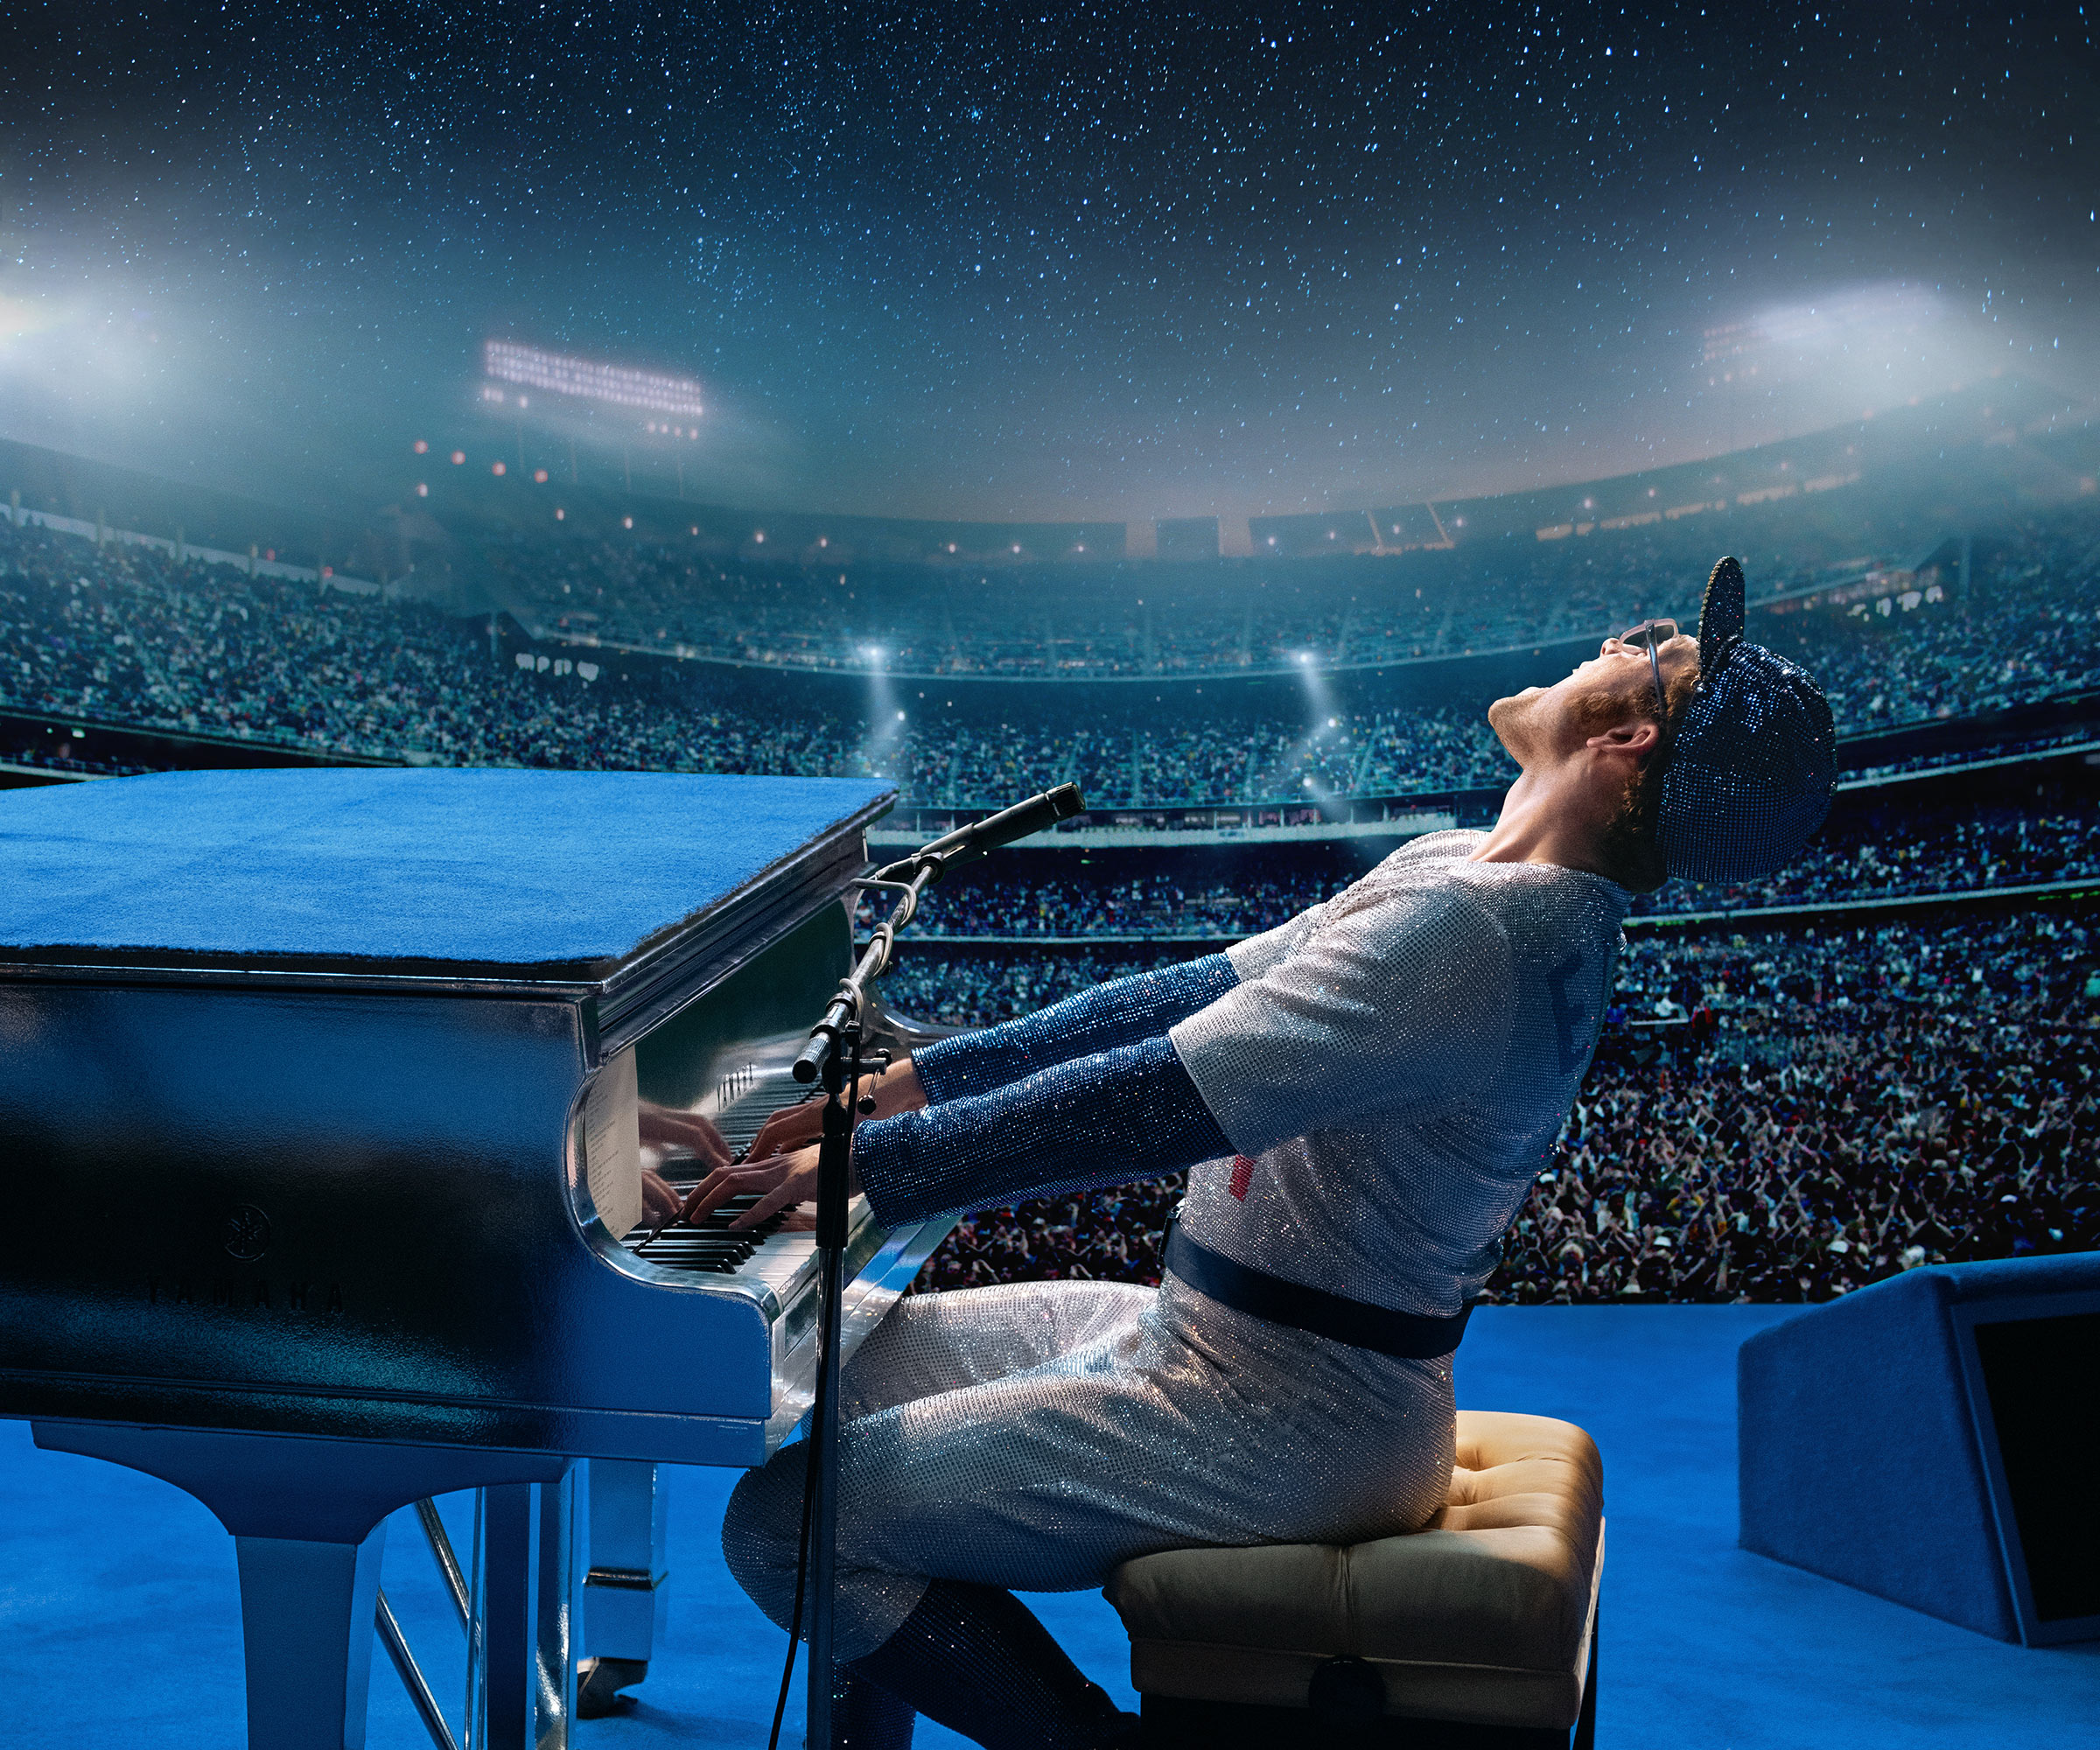 Taron Egerton performs as Elton John in Rocketman.